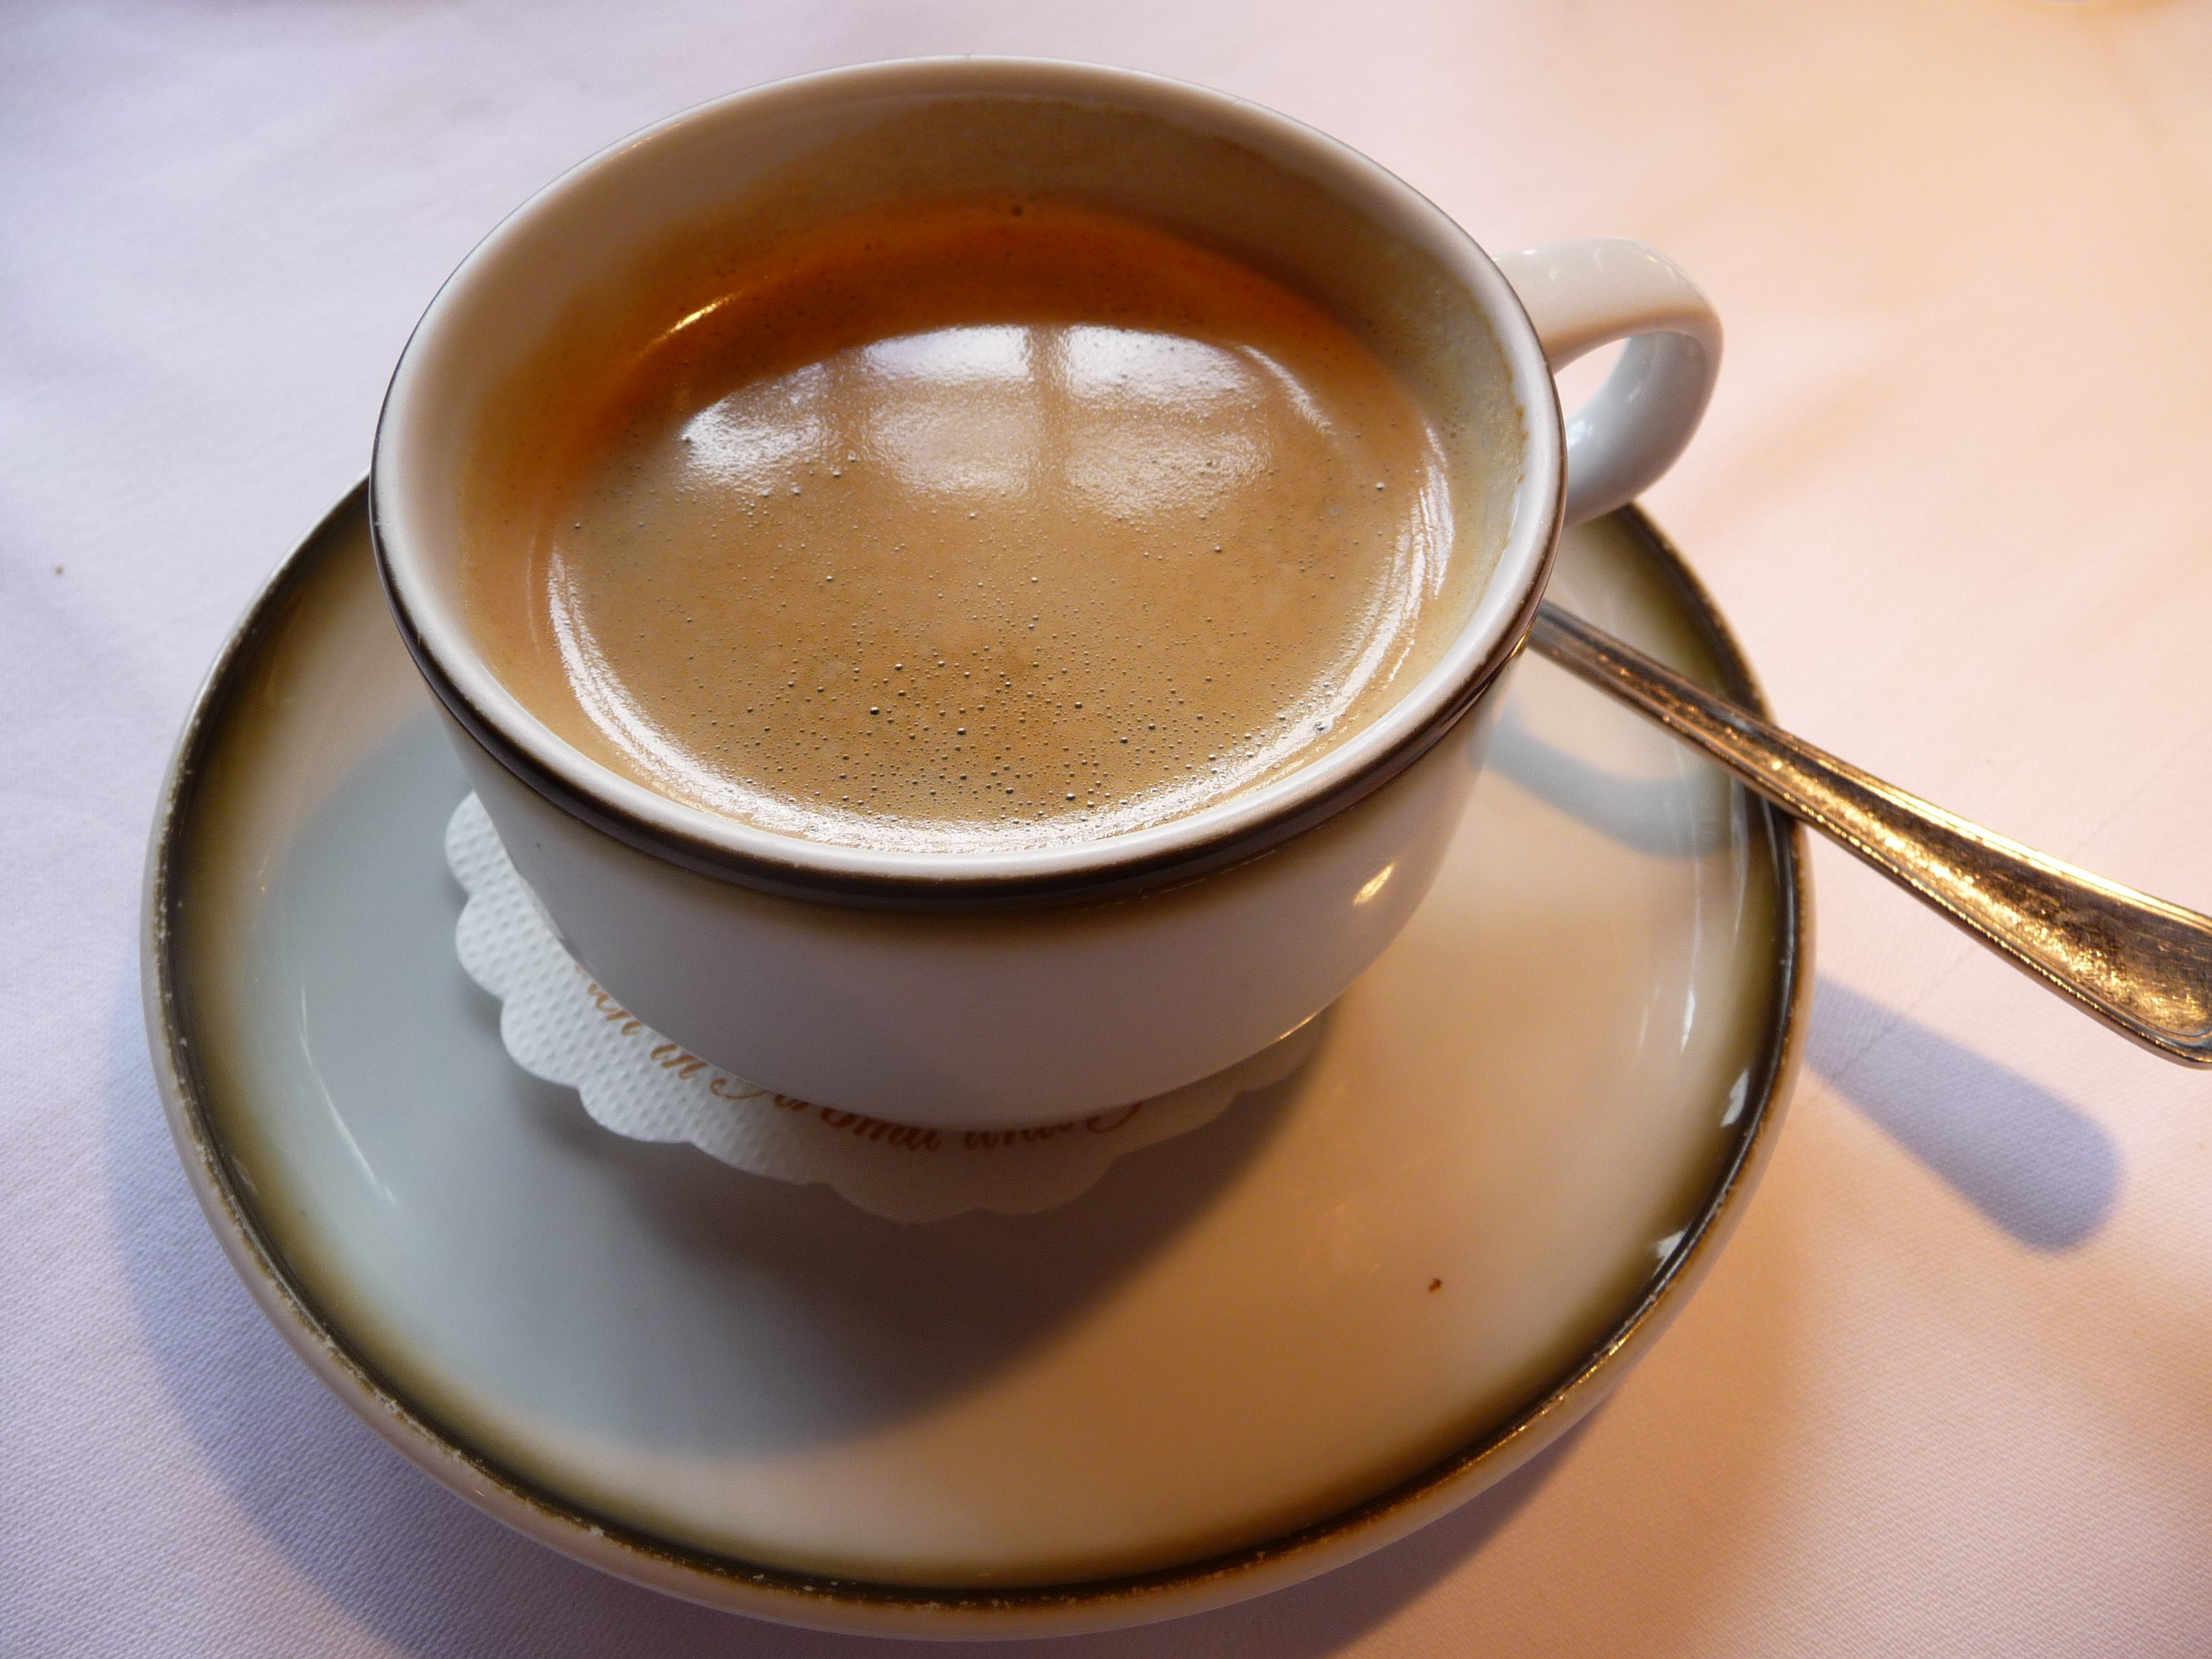 File:Tasse Kaffee.jpg - Wikimedia Commons